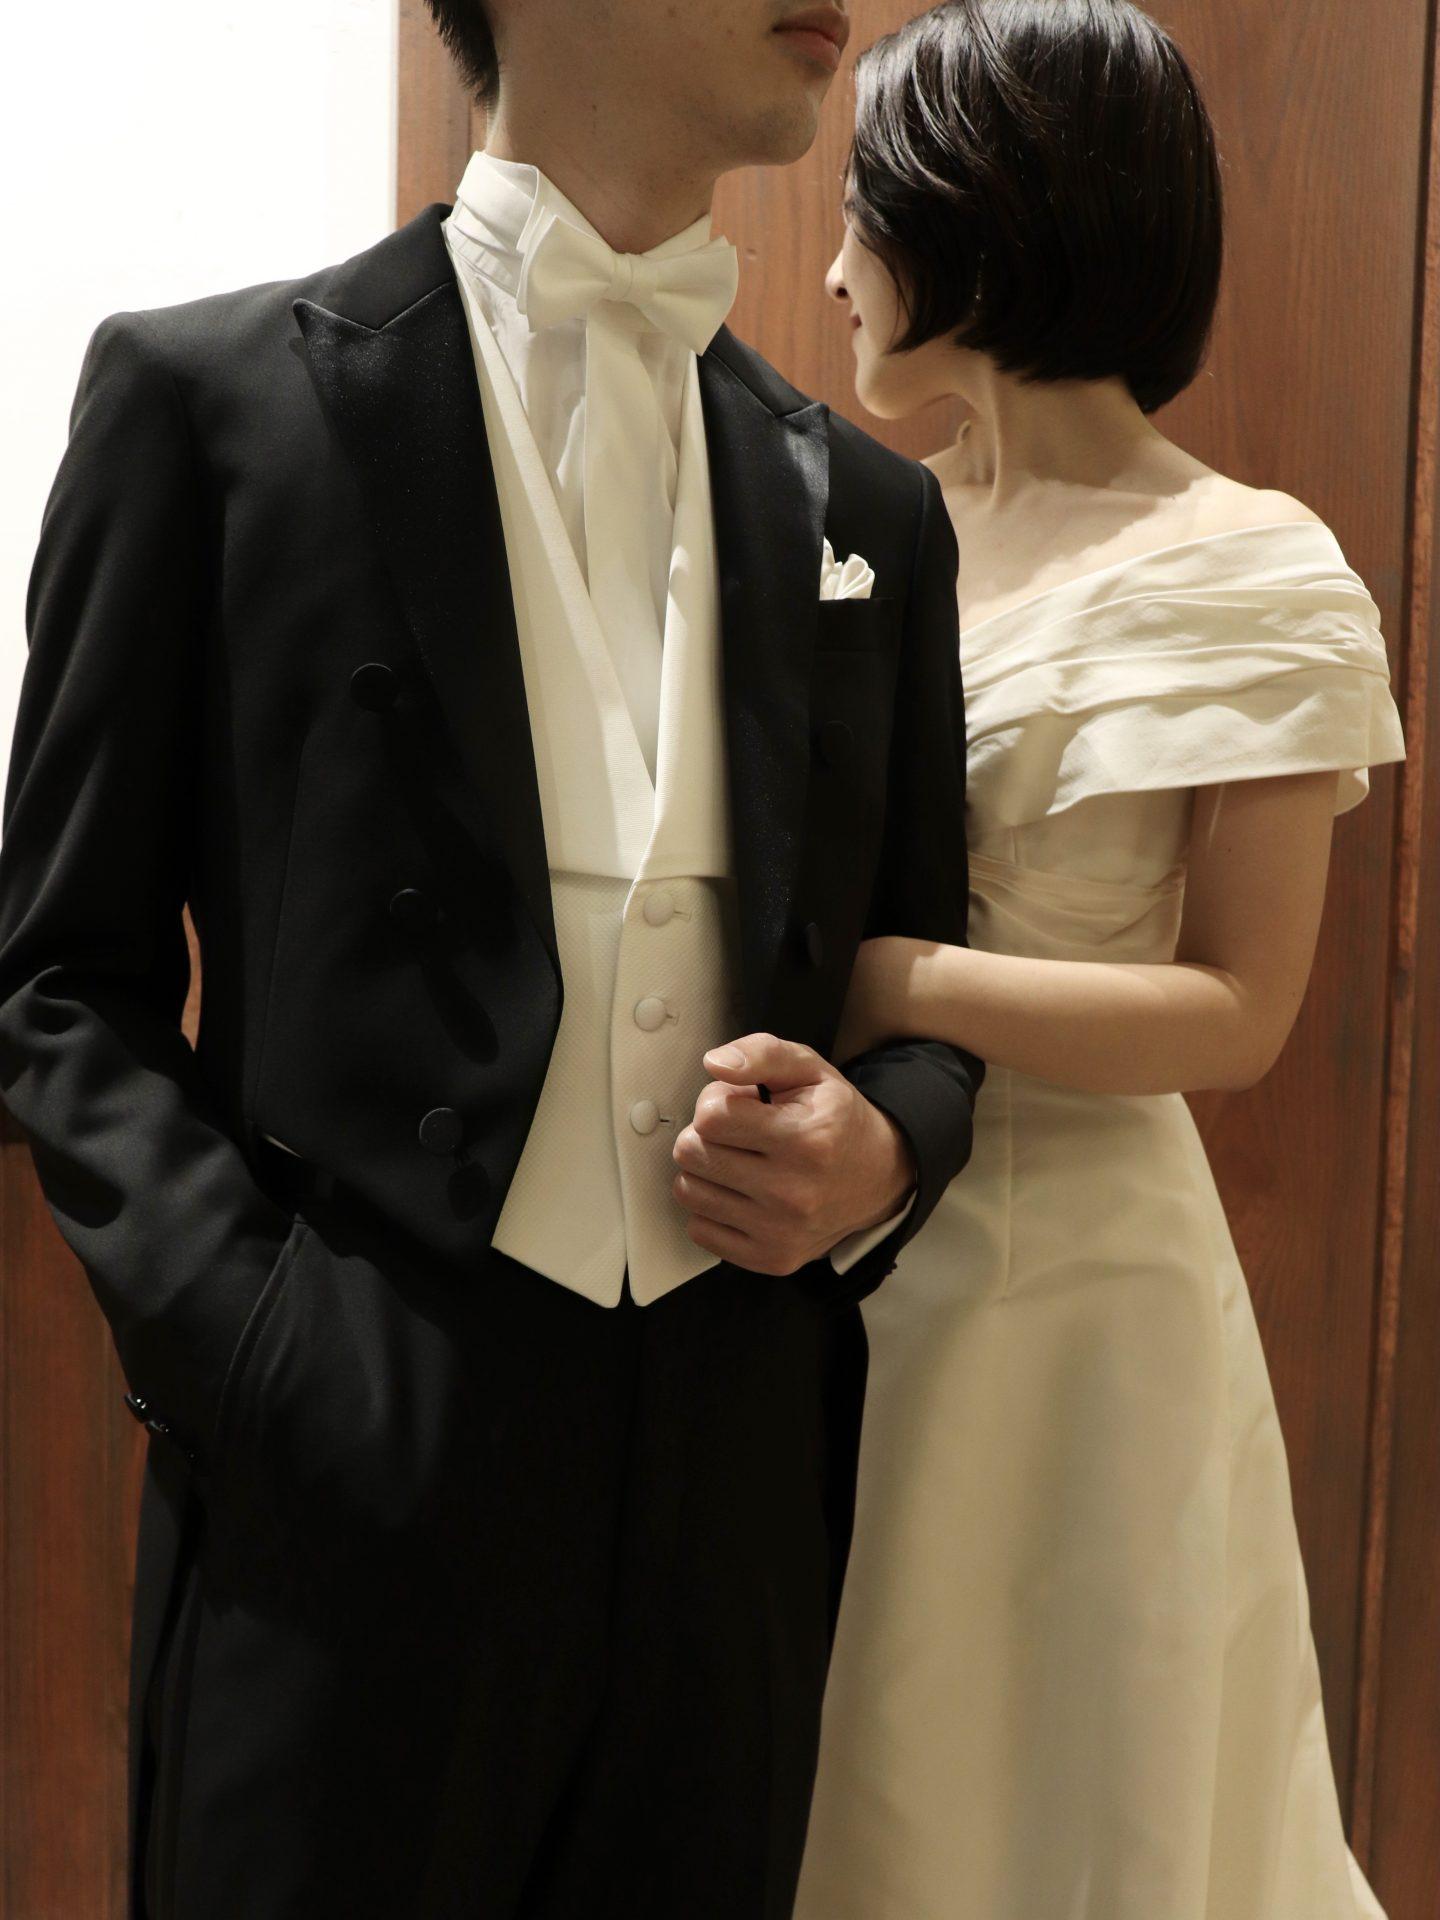 ・THE TREAT DRESSING名古屋店がおすすめしたいDORMEUILの生地を使った燕尾服